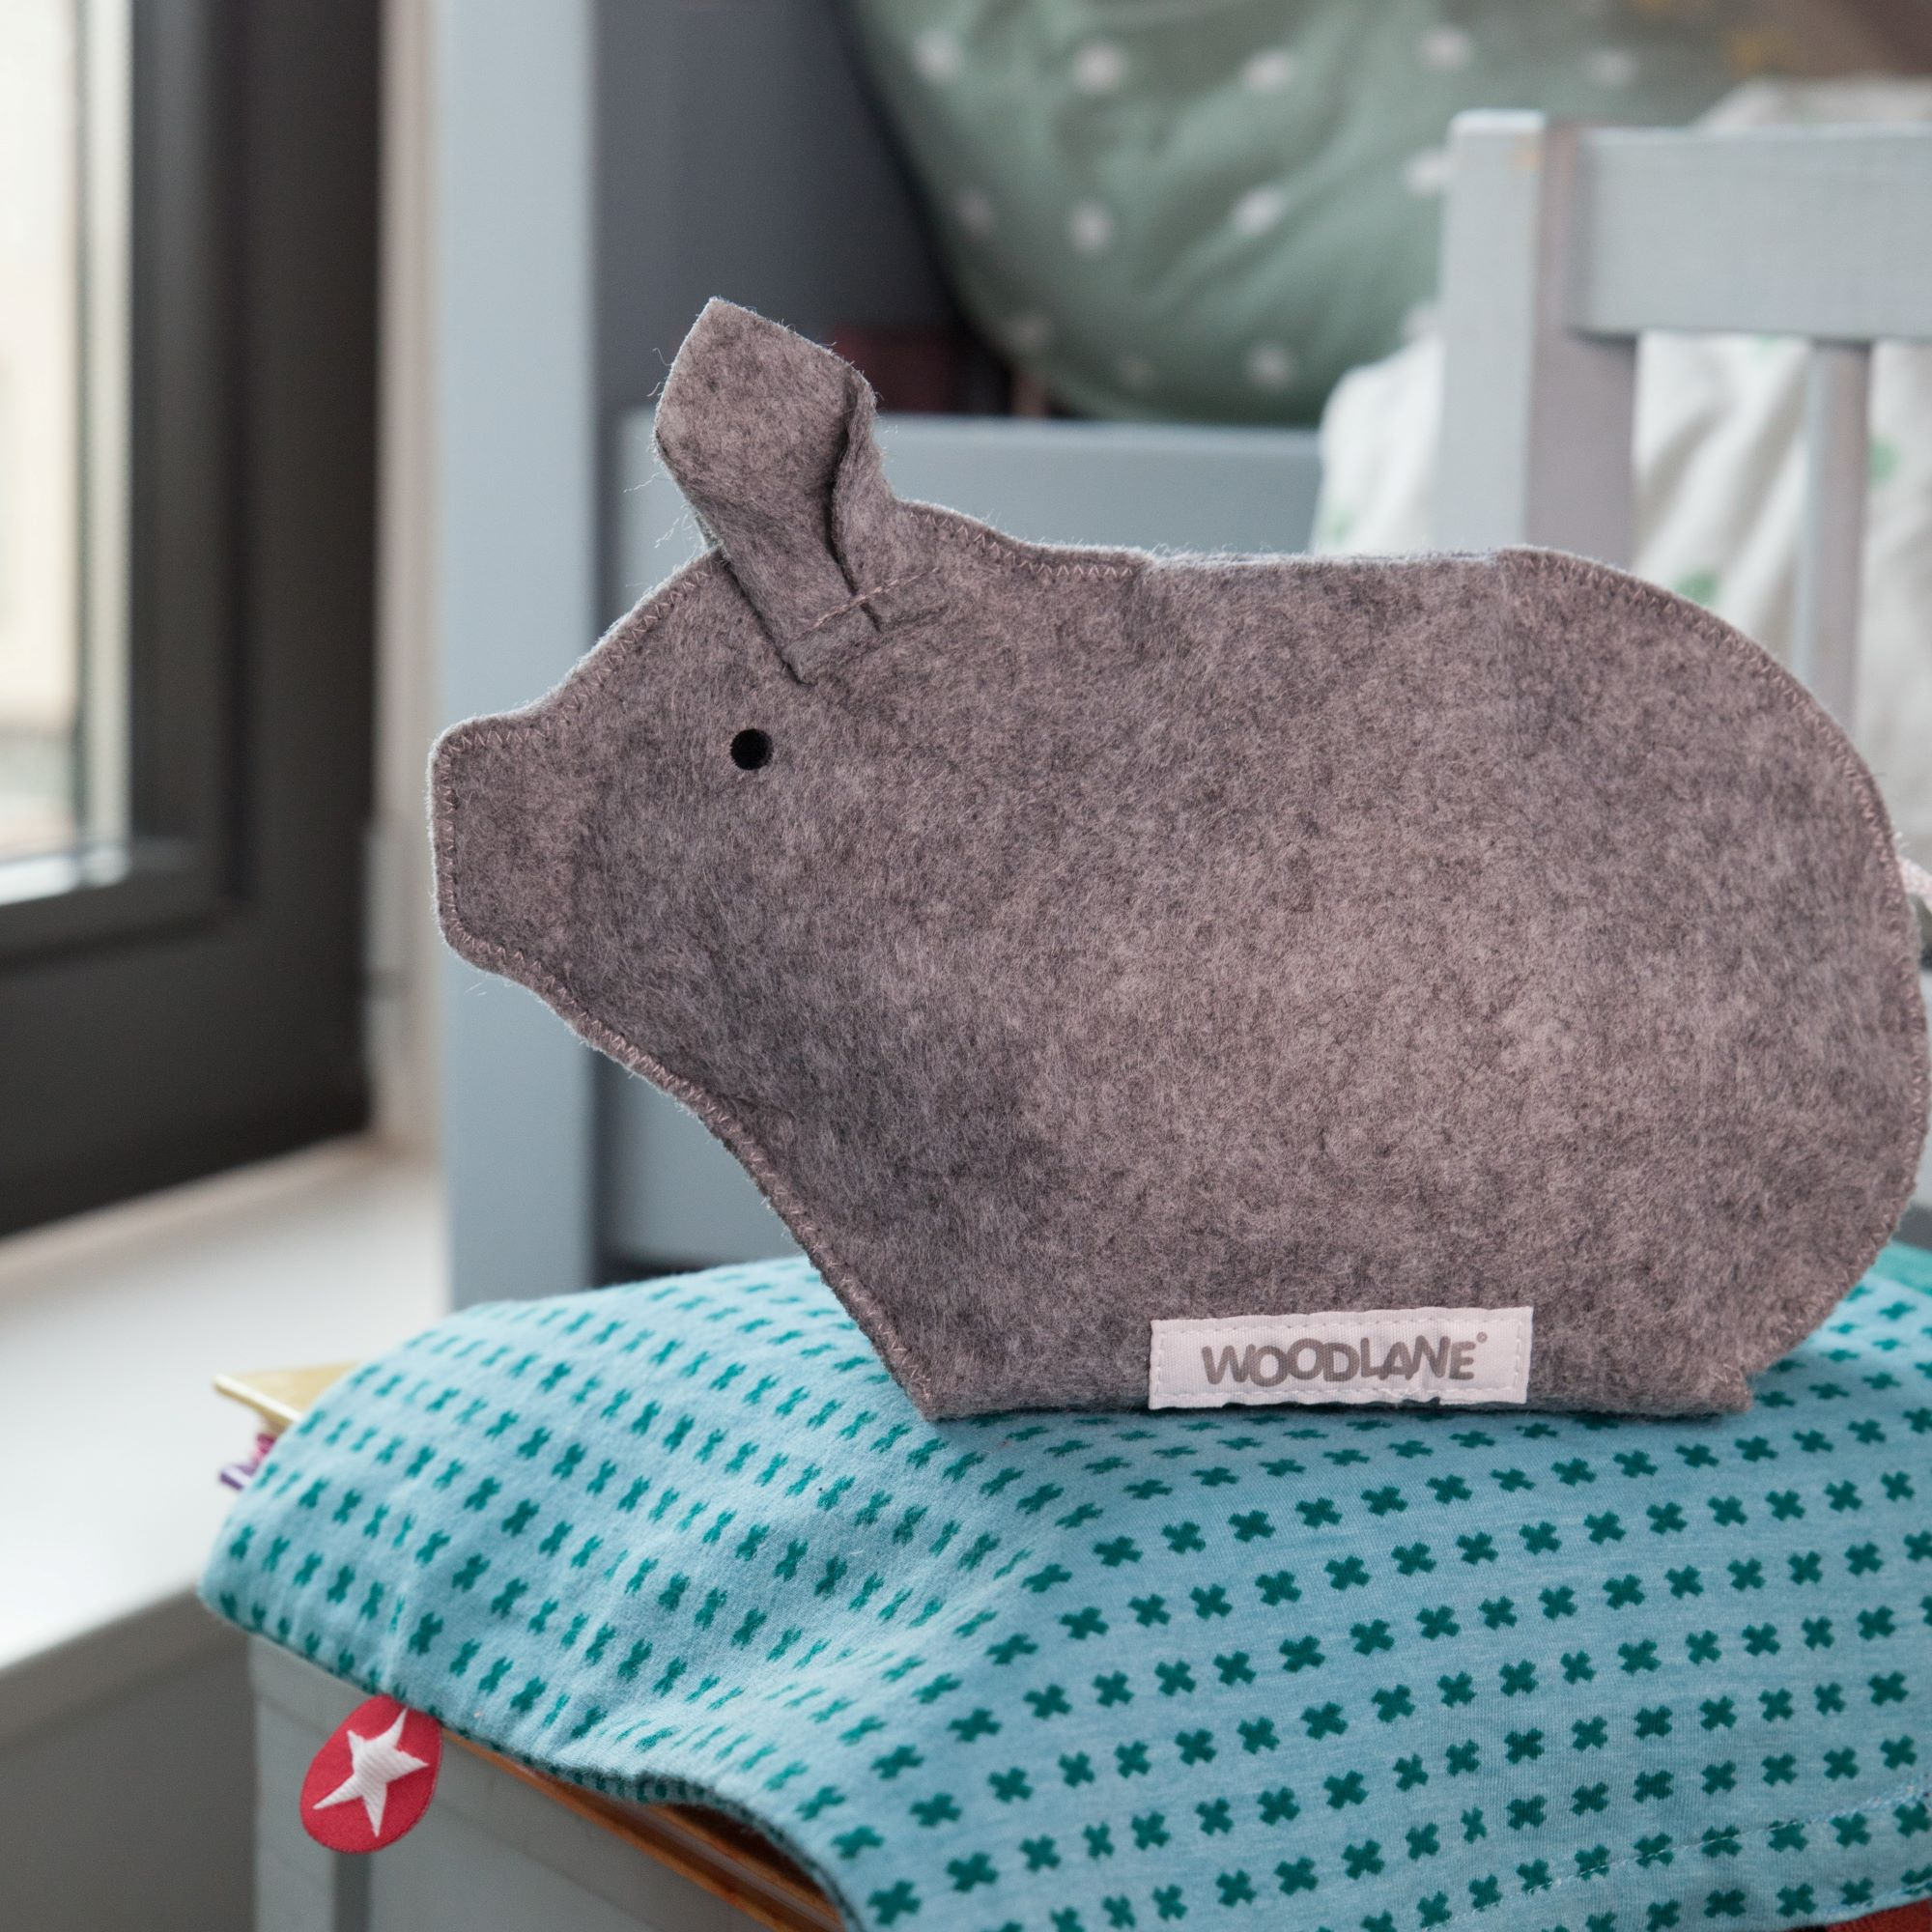 Woodlane Piggy-Frederique van Gemert-8781